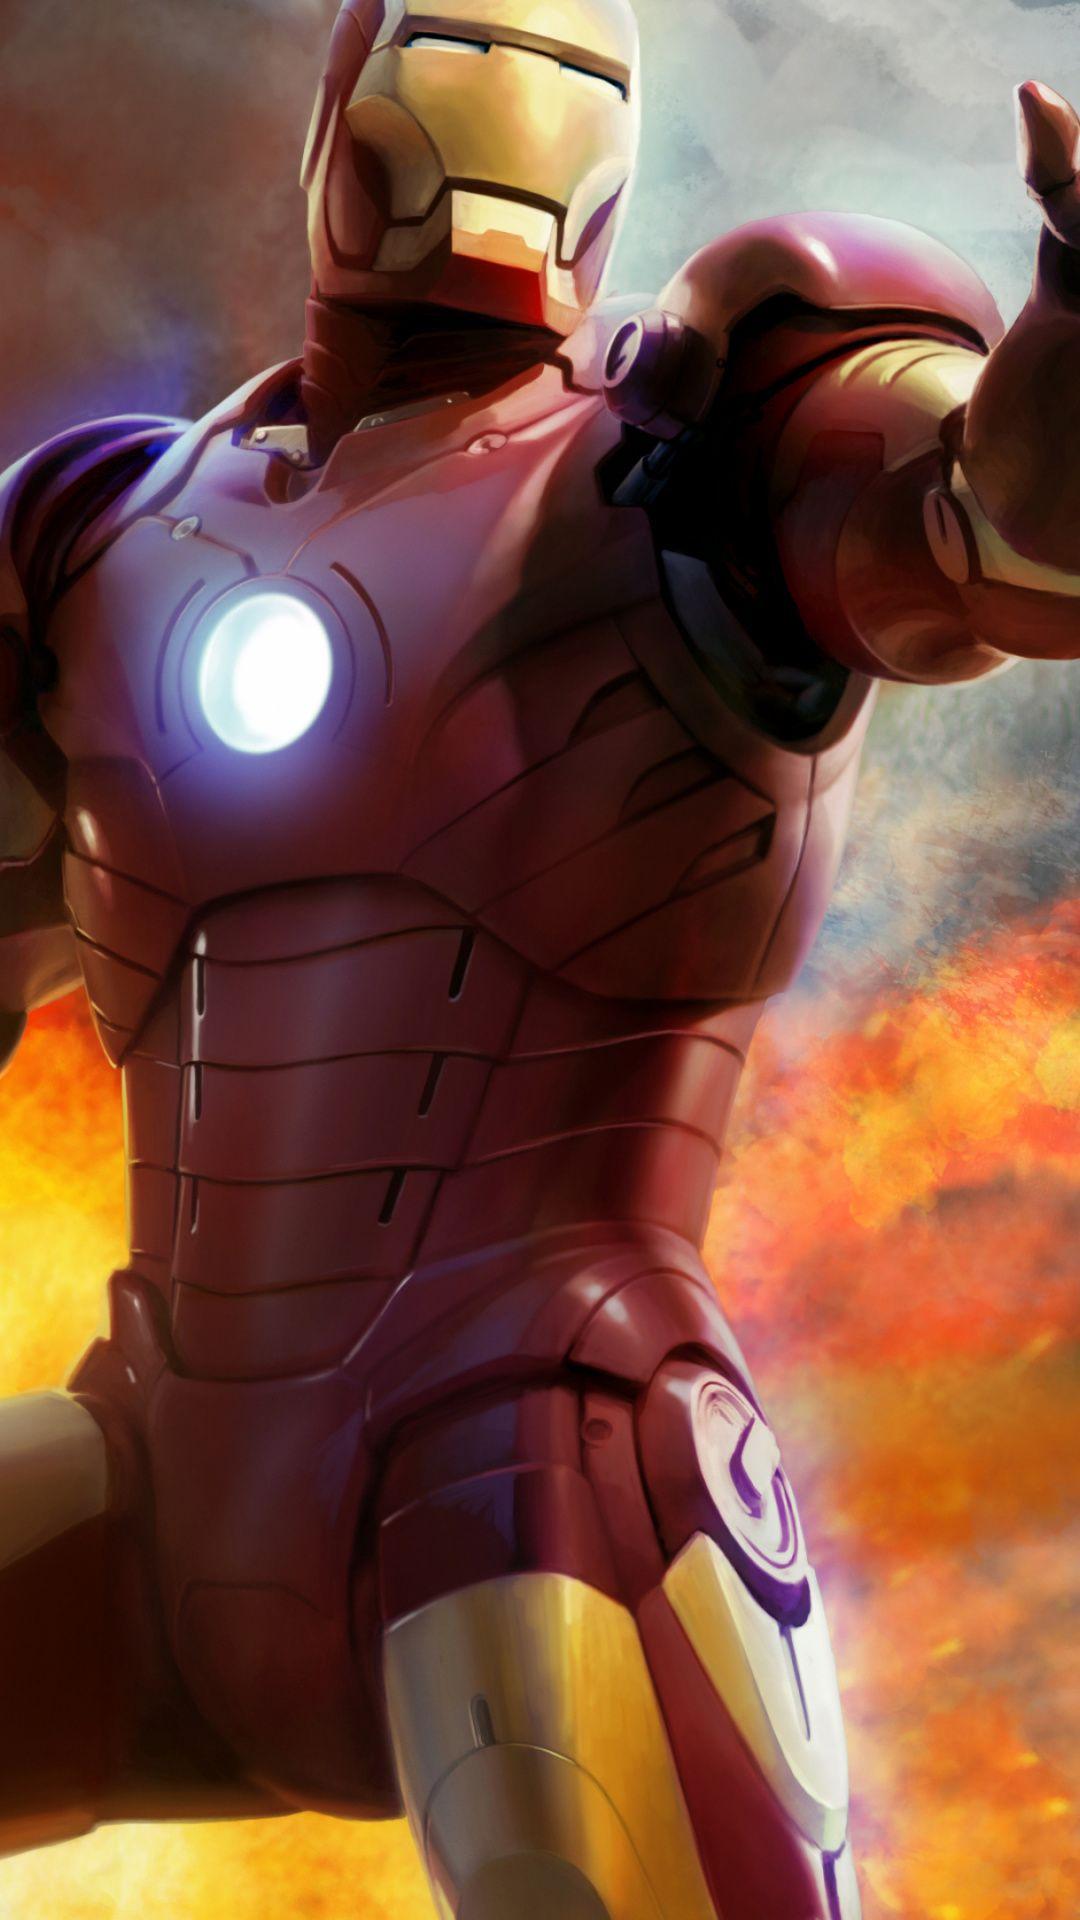 Wallpaper Figure, Superhero, Video Game, Iron Man Phone An